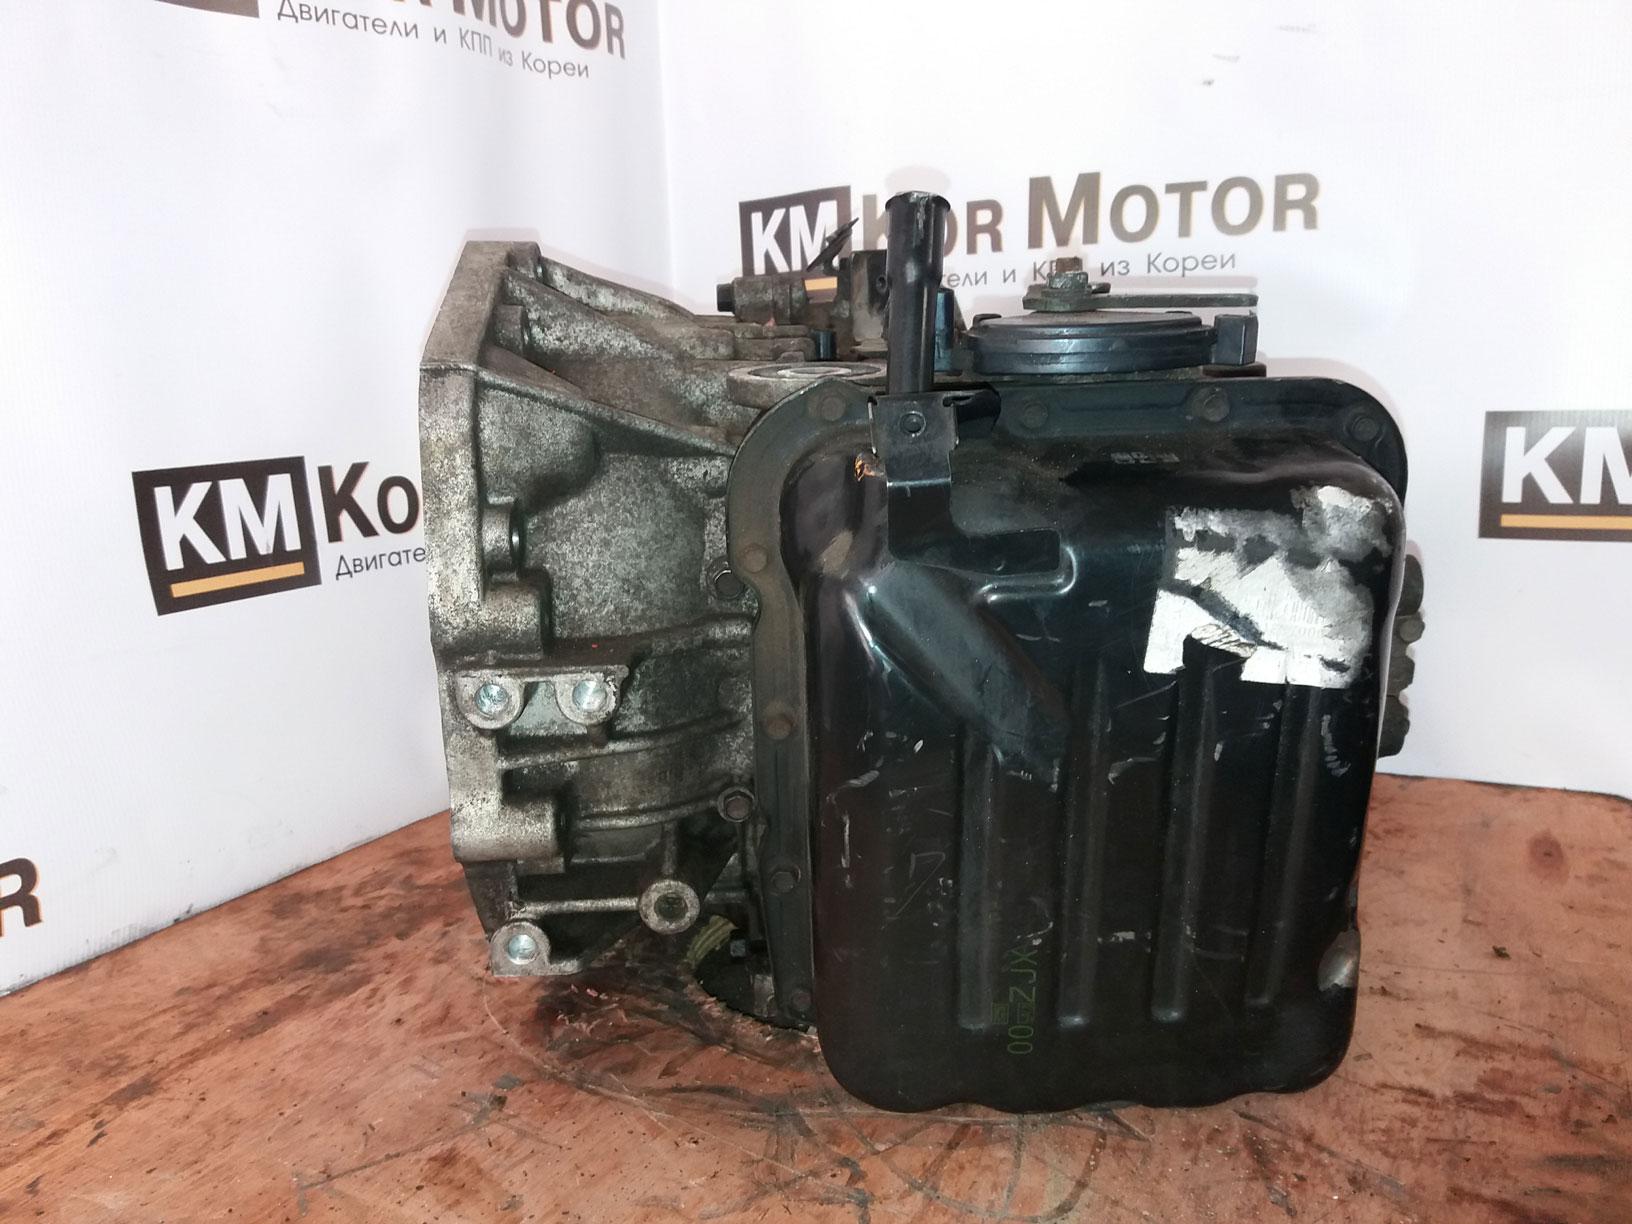 АКПП автомат Хендай Соната НФ ( Hyundai Sonata ), Киа Маджентис ( Kia Magentis ) G4KA, G4KD 4500039AH5, 4500039AQ0, 4500039AQ2, 4500039AQ1, 4500039013, 4500039AF5, 4500039050, 4500039AE0